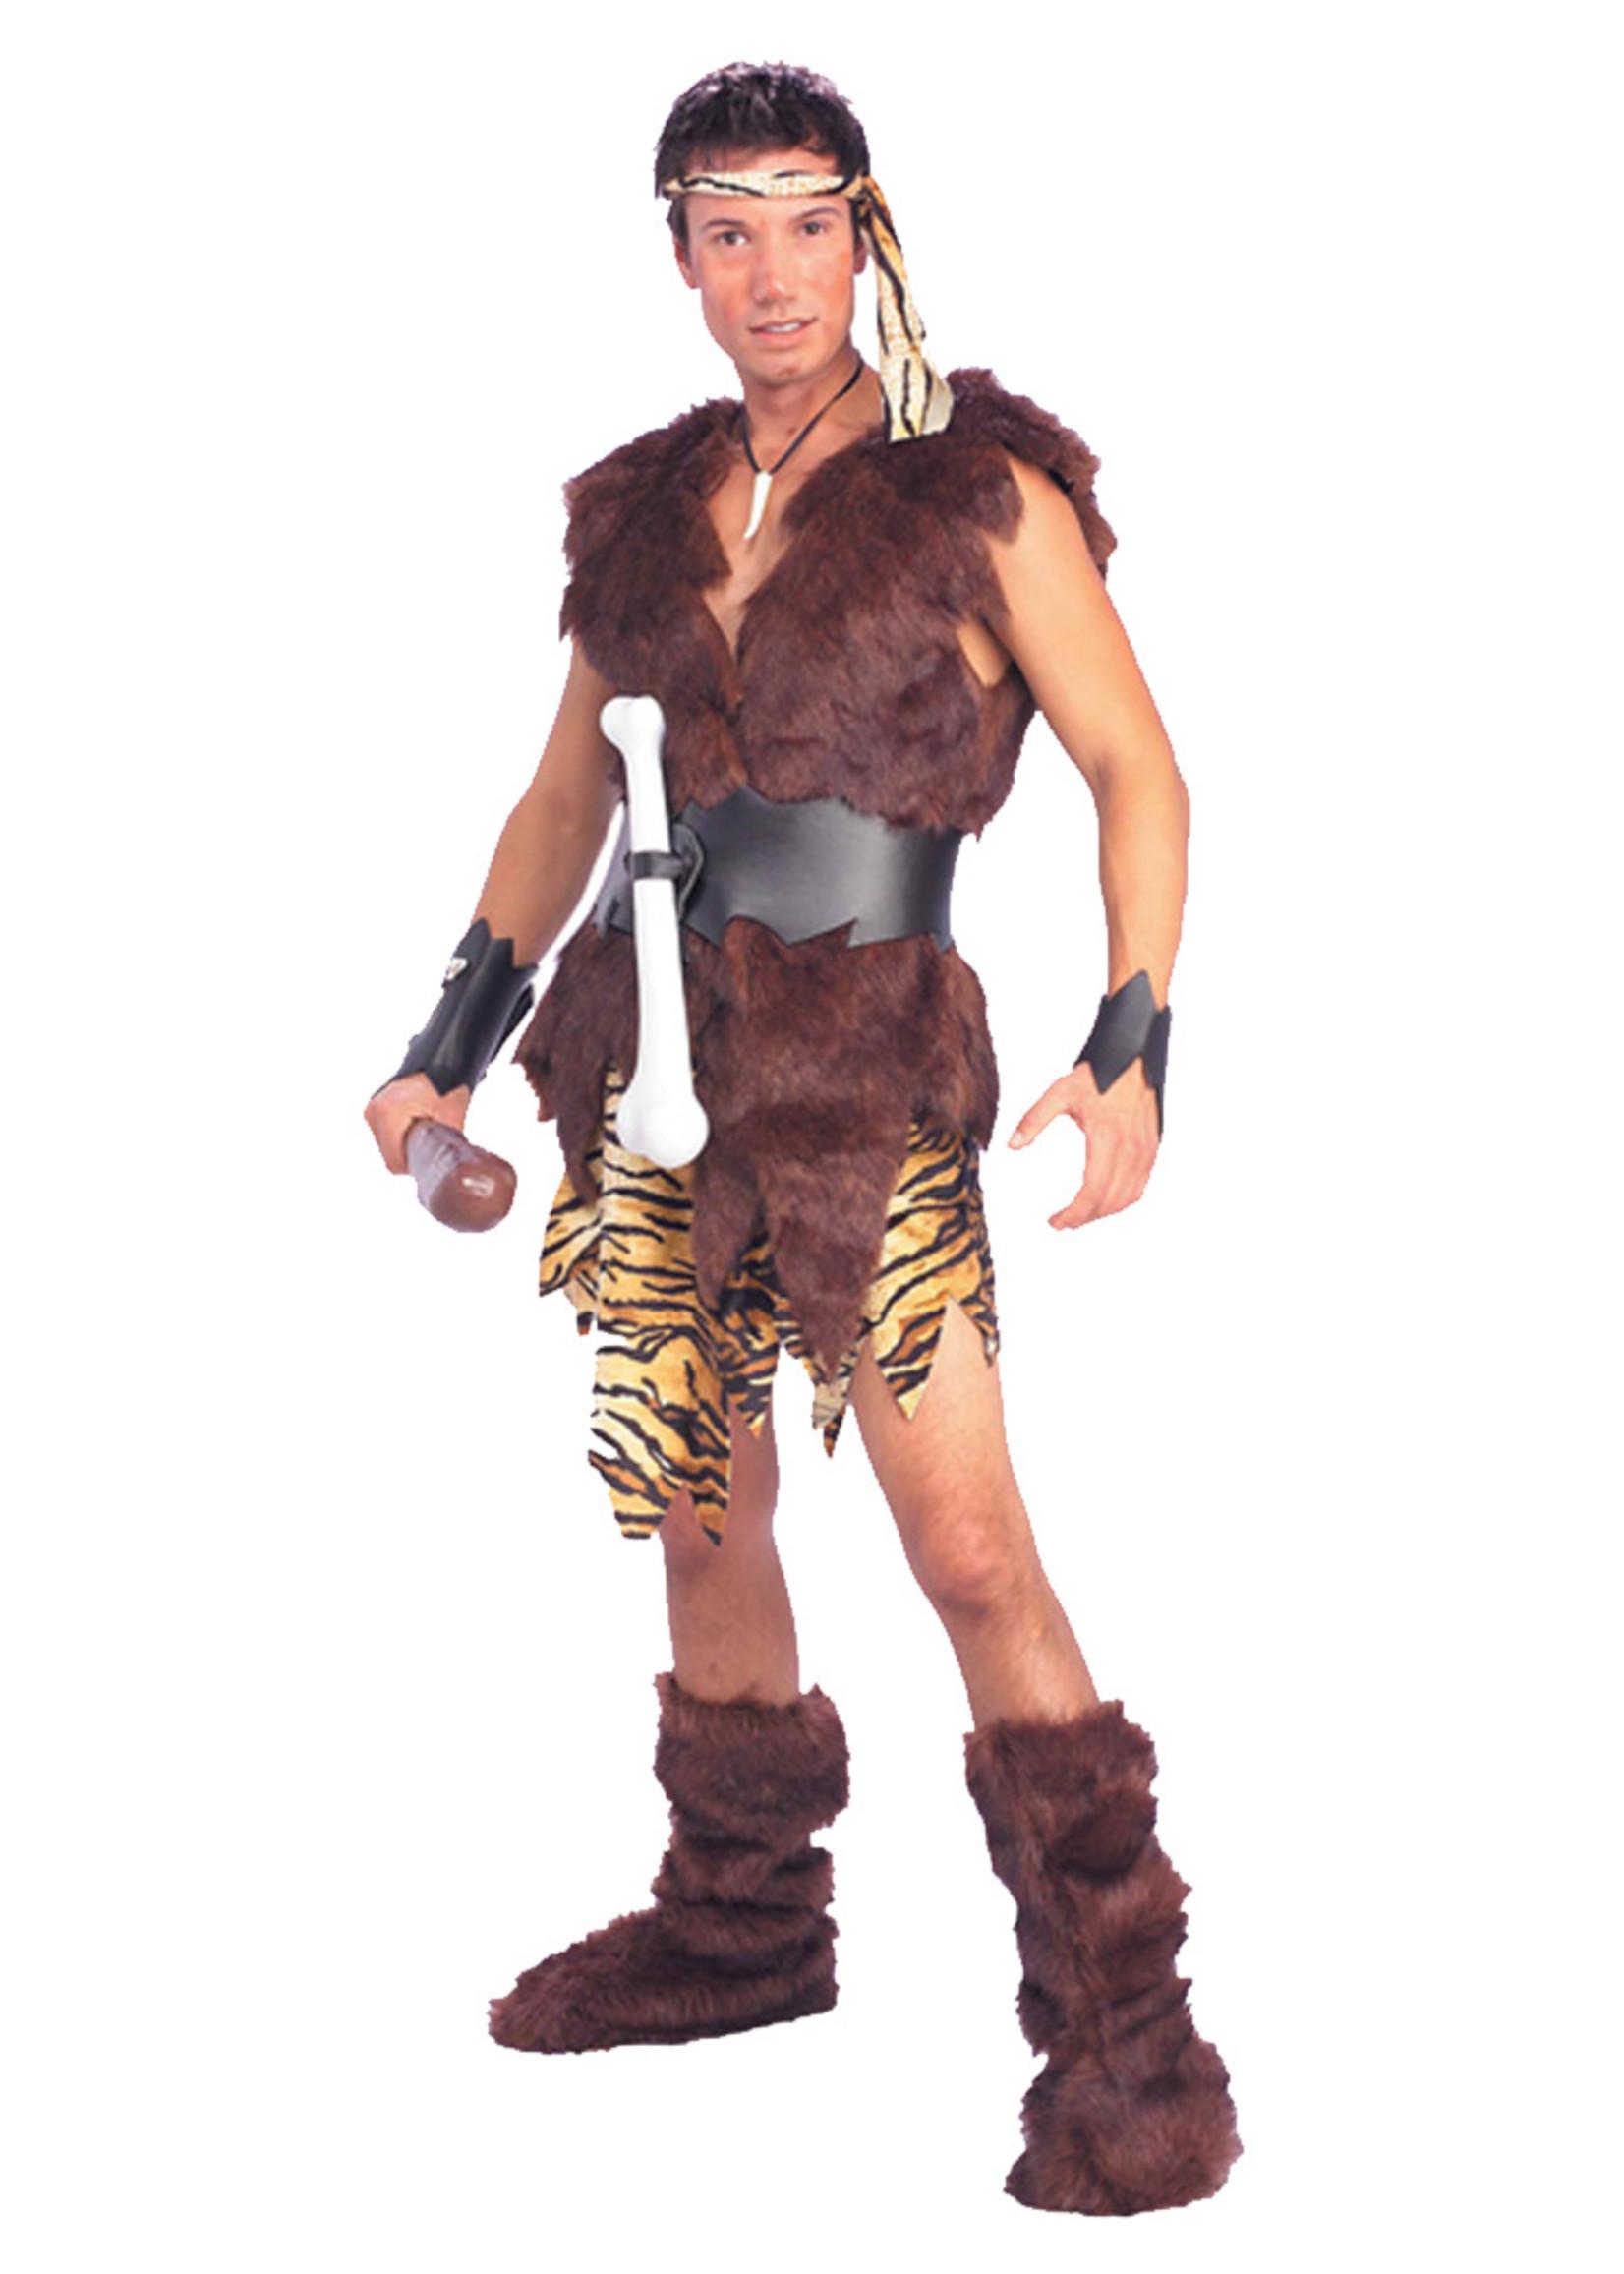 King Of Caves Costume - Men's